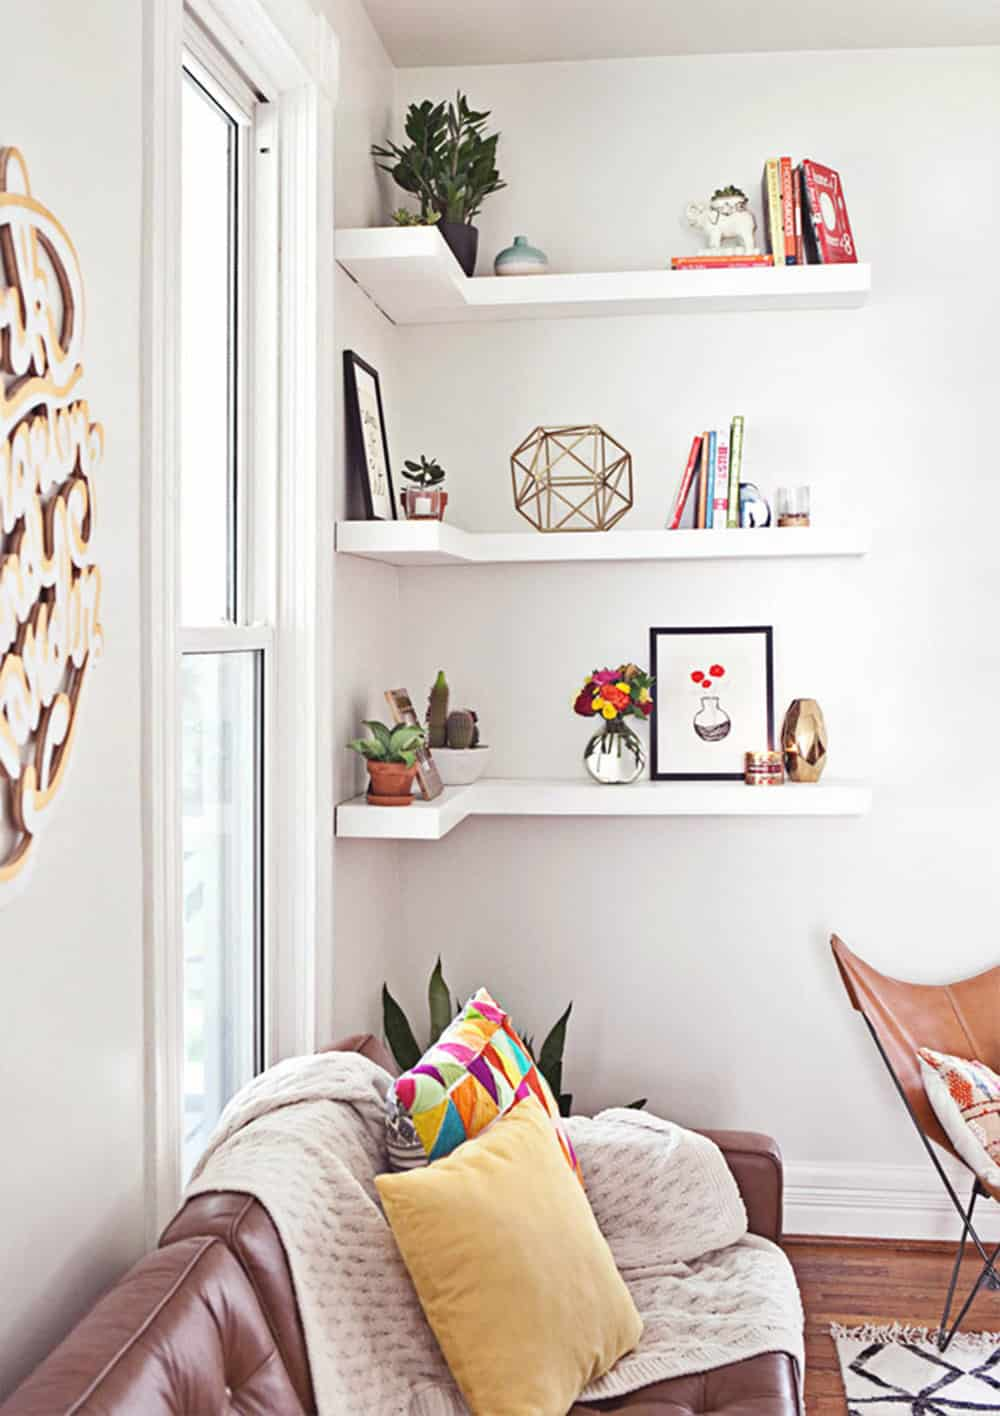 DIY Floating Shelves Can Transform A Room